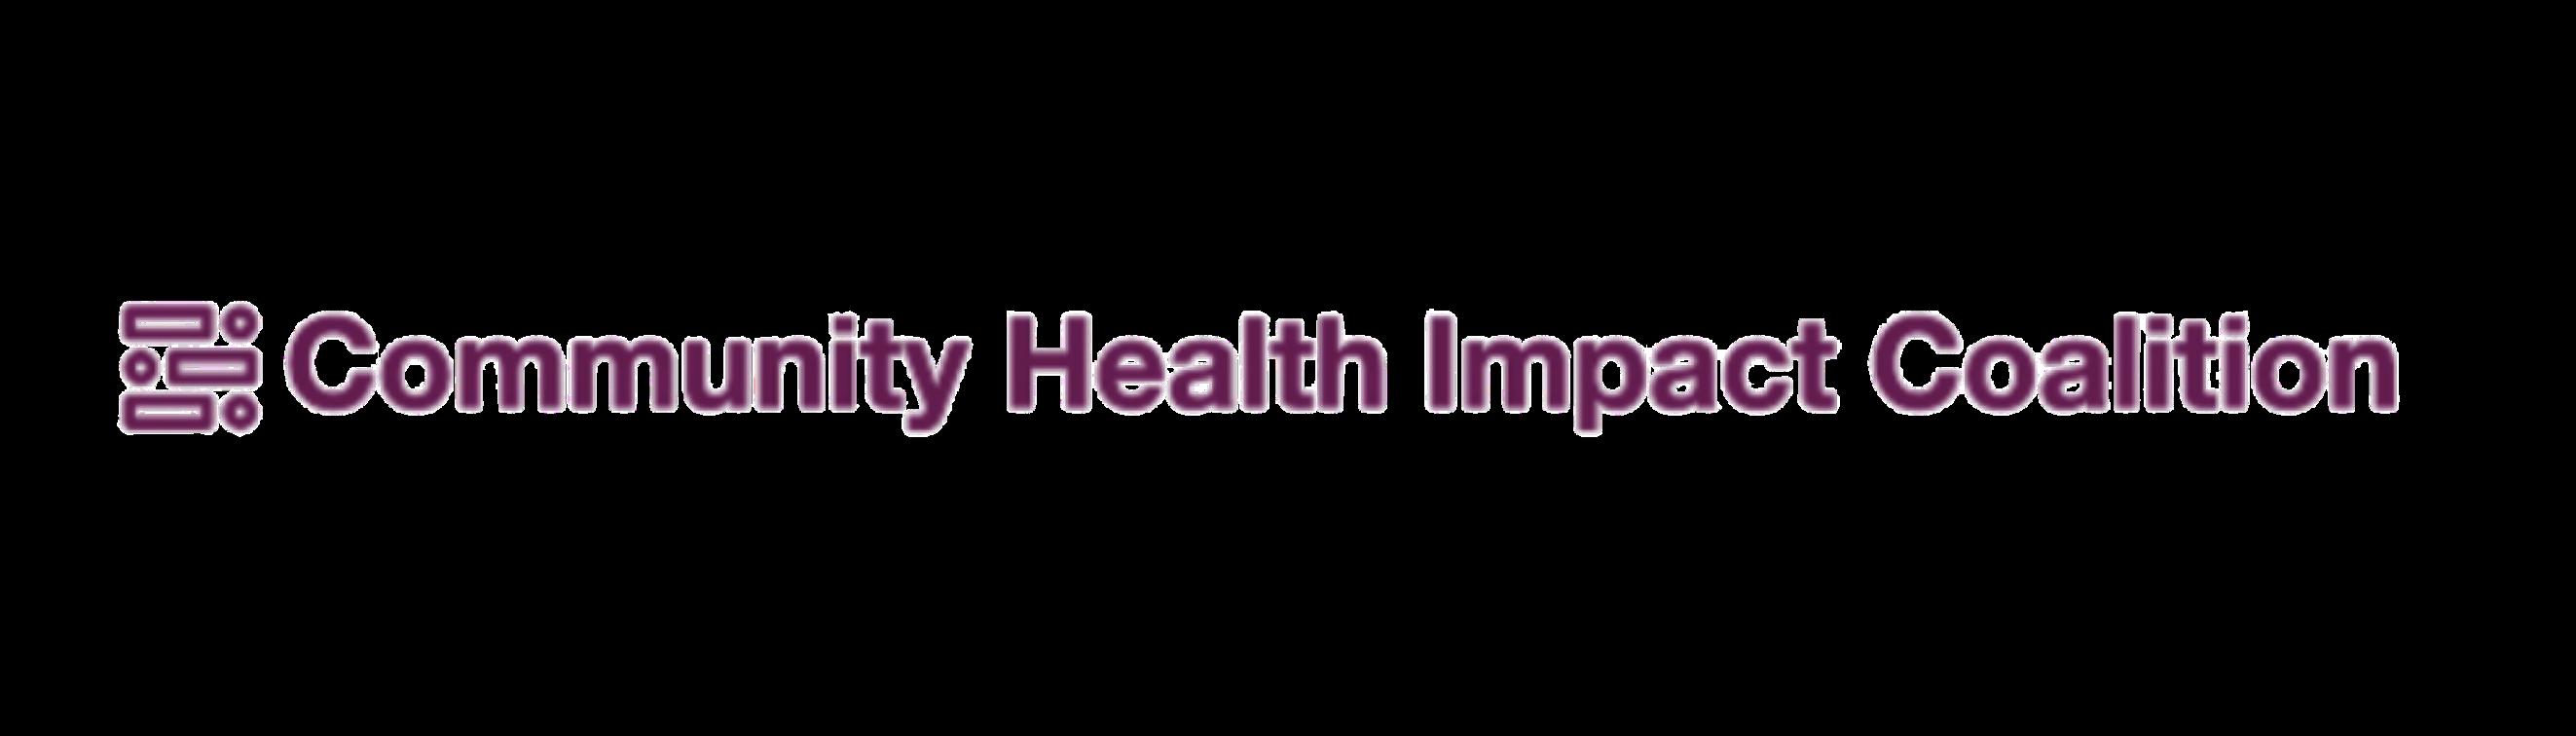 Community Health Impact Coalition